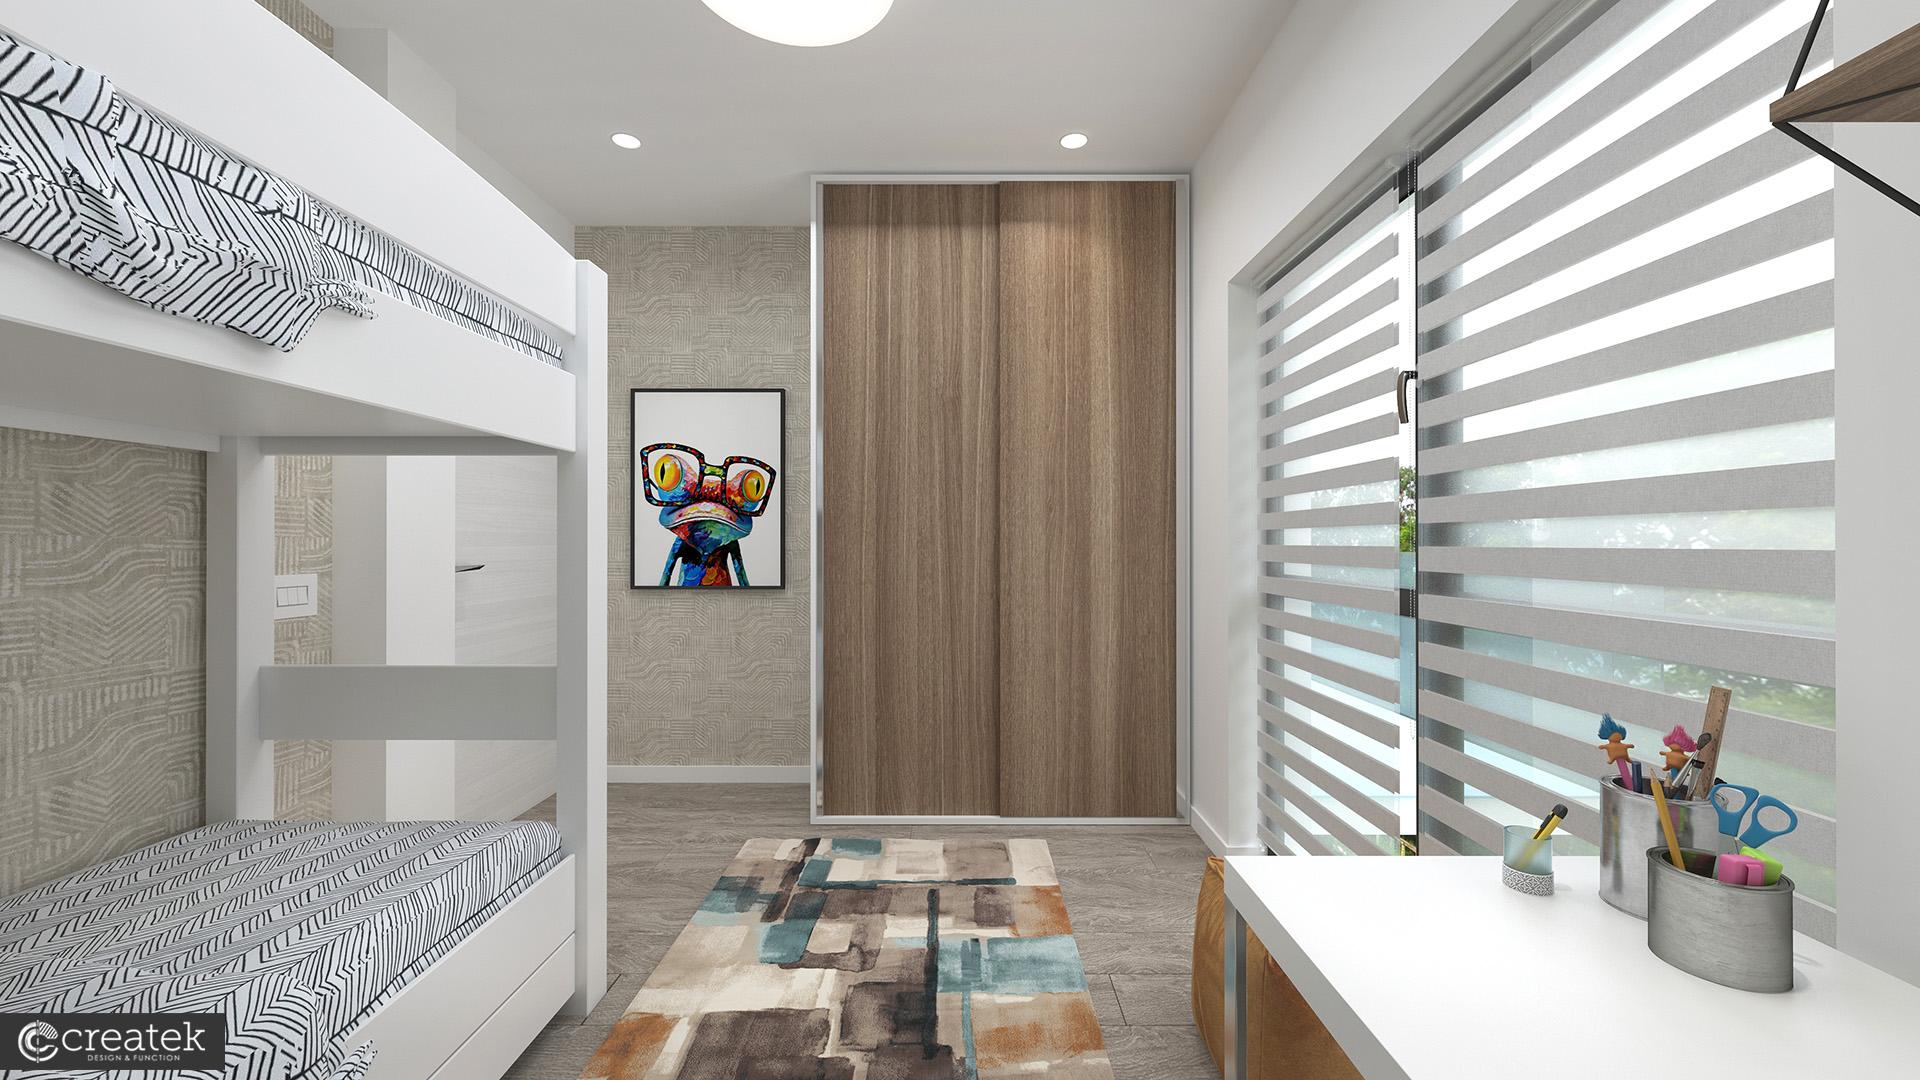 038-Dormitor-Copii-Design-Interior-Casa-Ovidiu-Lac